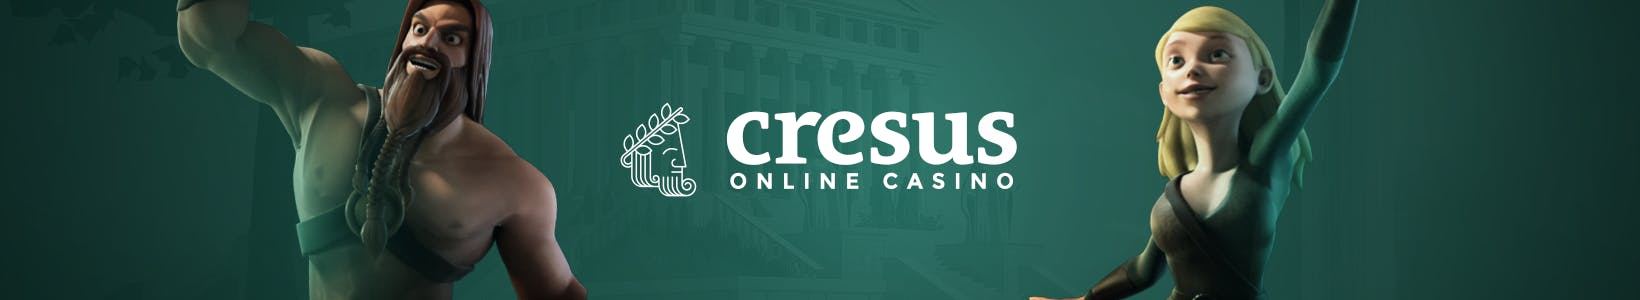 cresus casino banniere originale de promotion par kagino fr